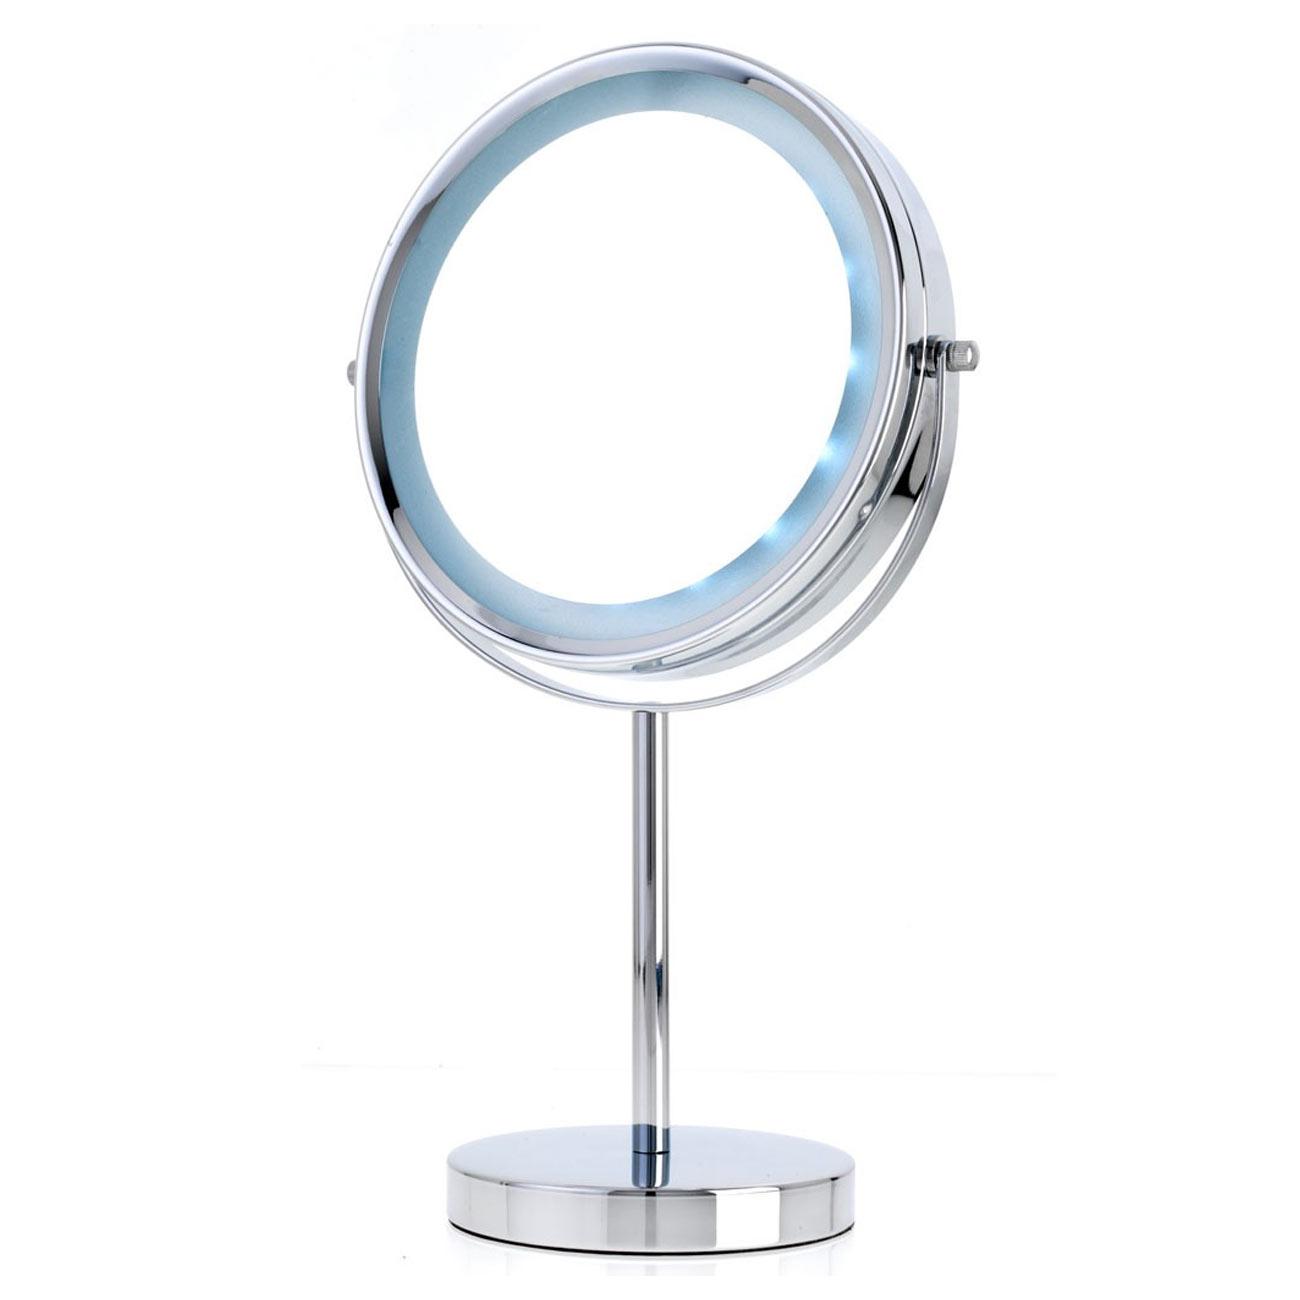 Danielle LED Lit 2-in-1 Mirror - Chrome - 5x